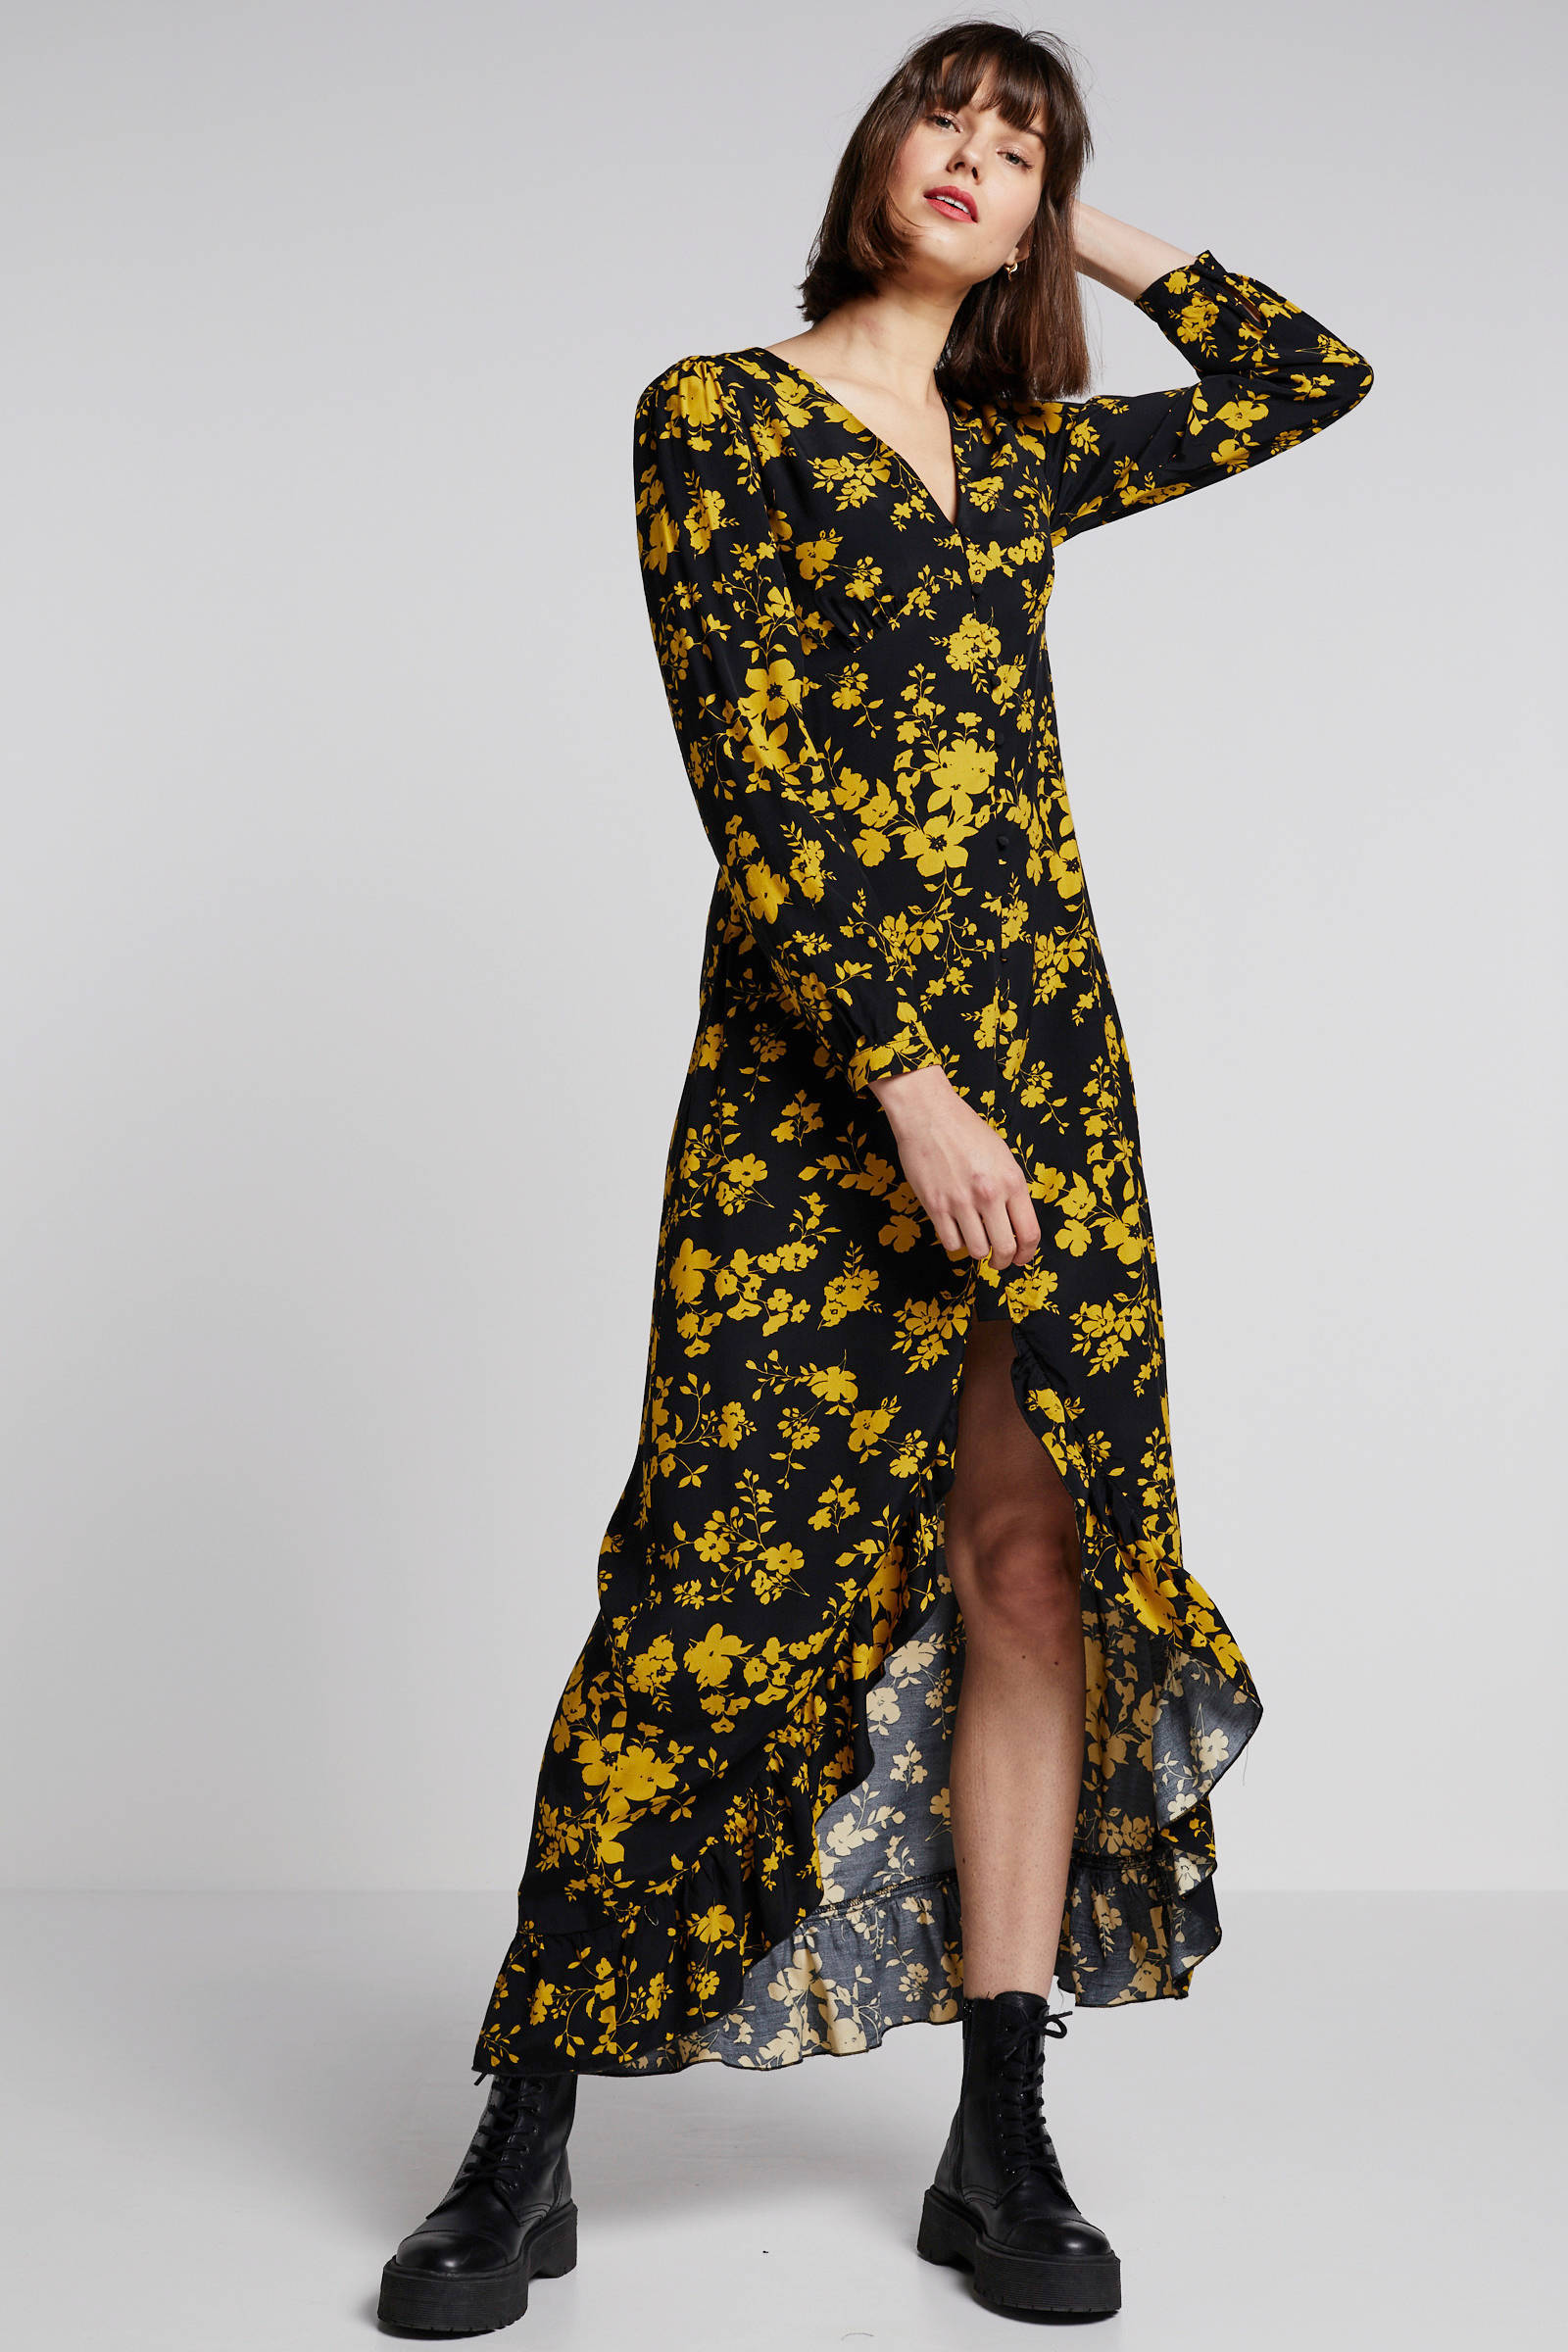 jurk zwart gele schoenen